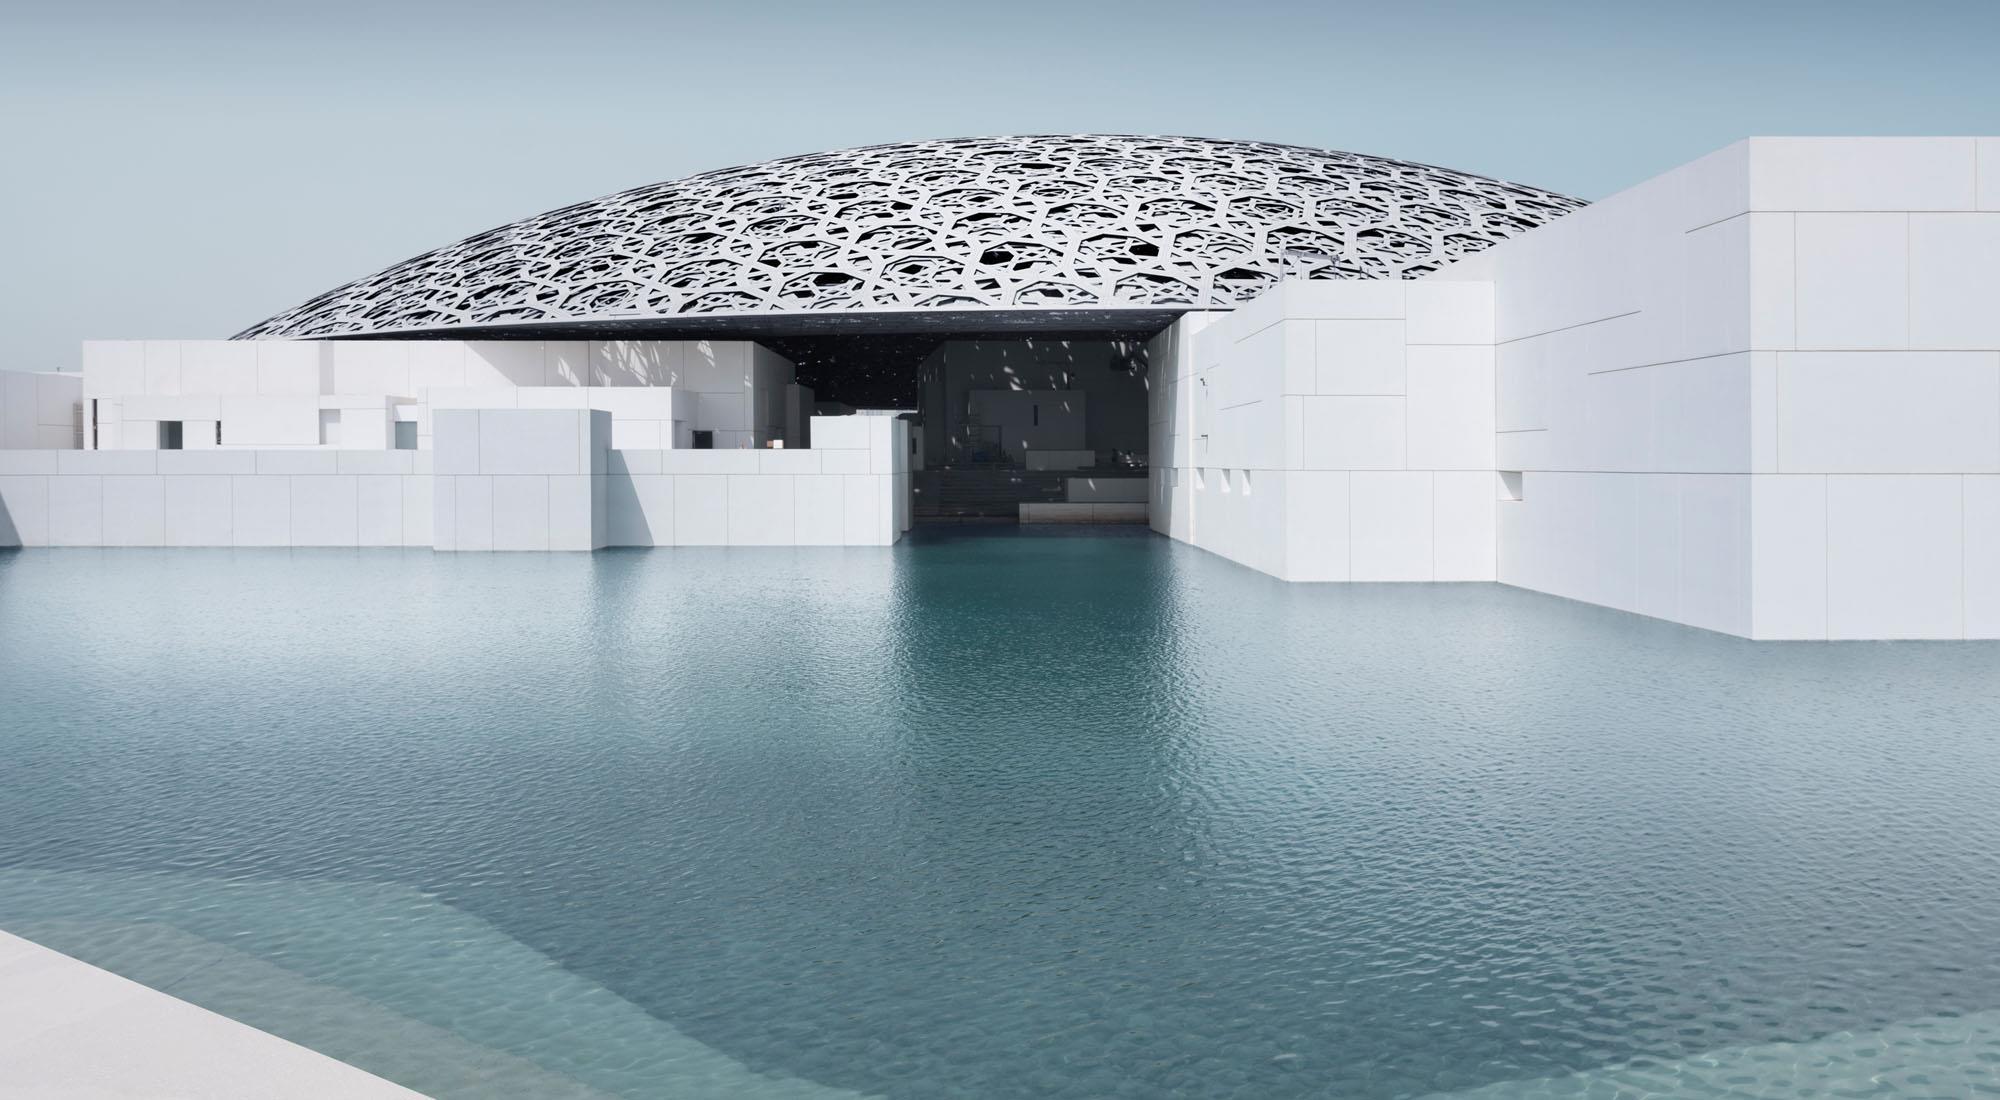 https://alukoenigstahl.md/wp-content/uploads/sites/4/2020/08/Louvre-Abu-Dhabi1.jpg